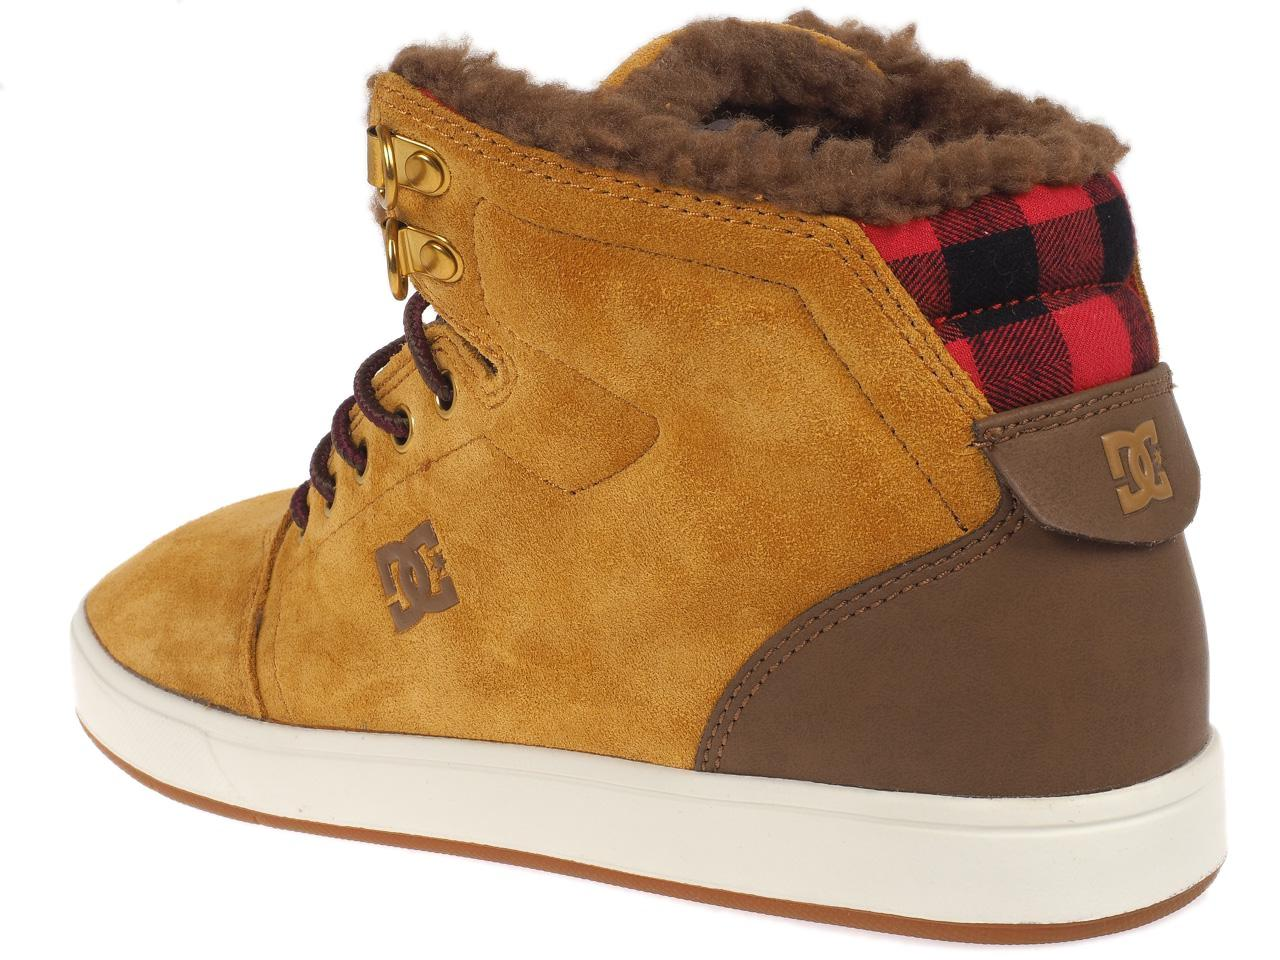 Chaussures-mid-mi-montantes-Dc-shoes-Crisis-high-sherpa-camel-Marron-75484-Neu